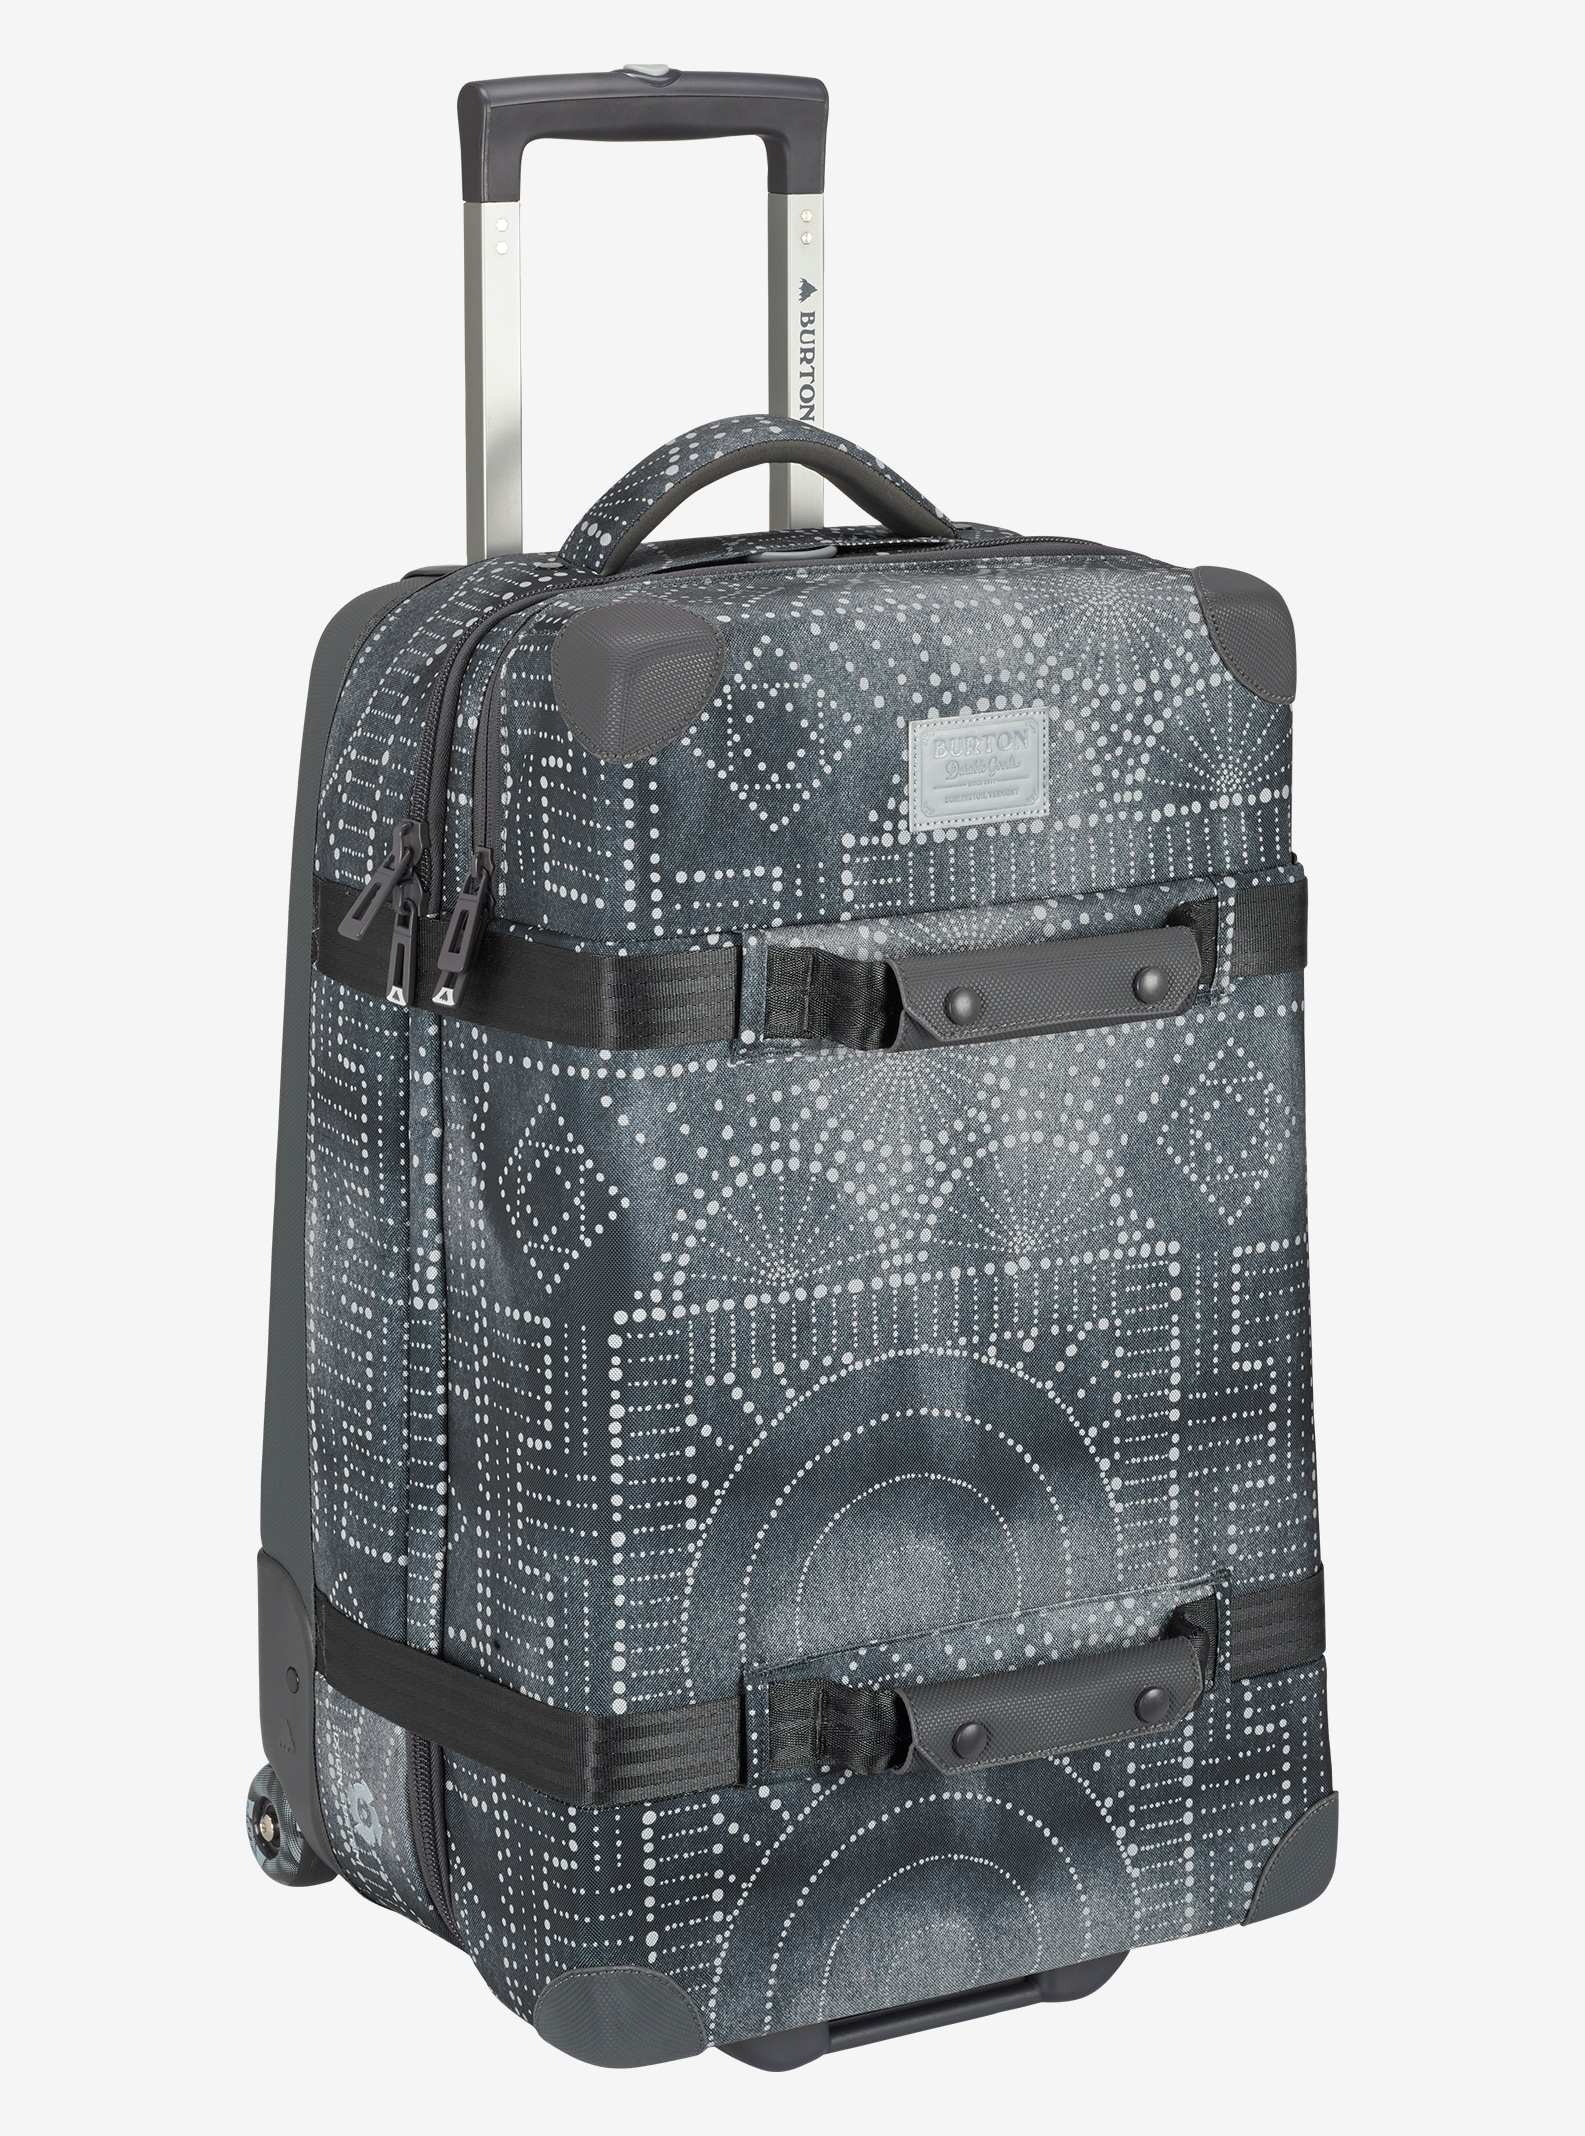 Burton Wheelie Cargo Travel Bag shown in Bandotta Print